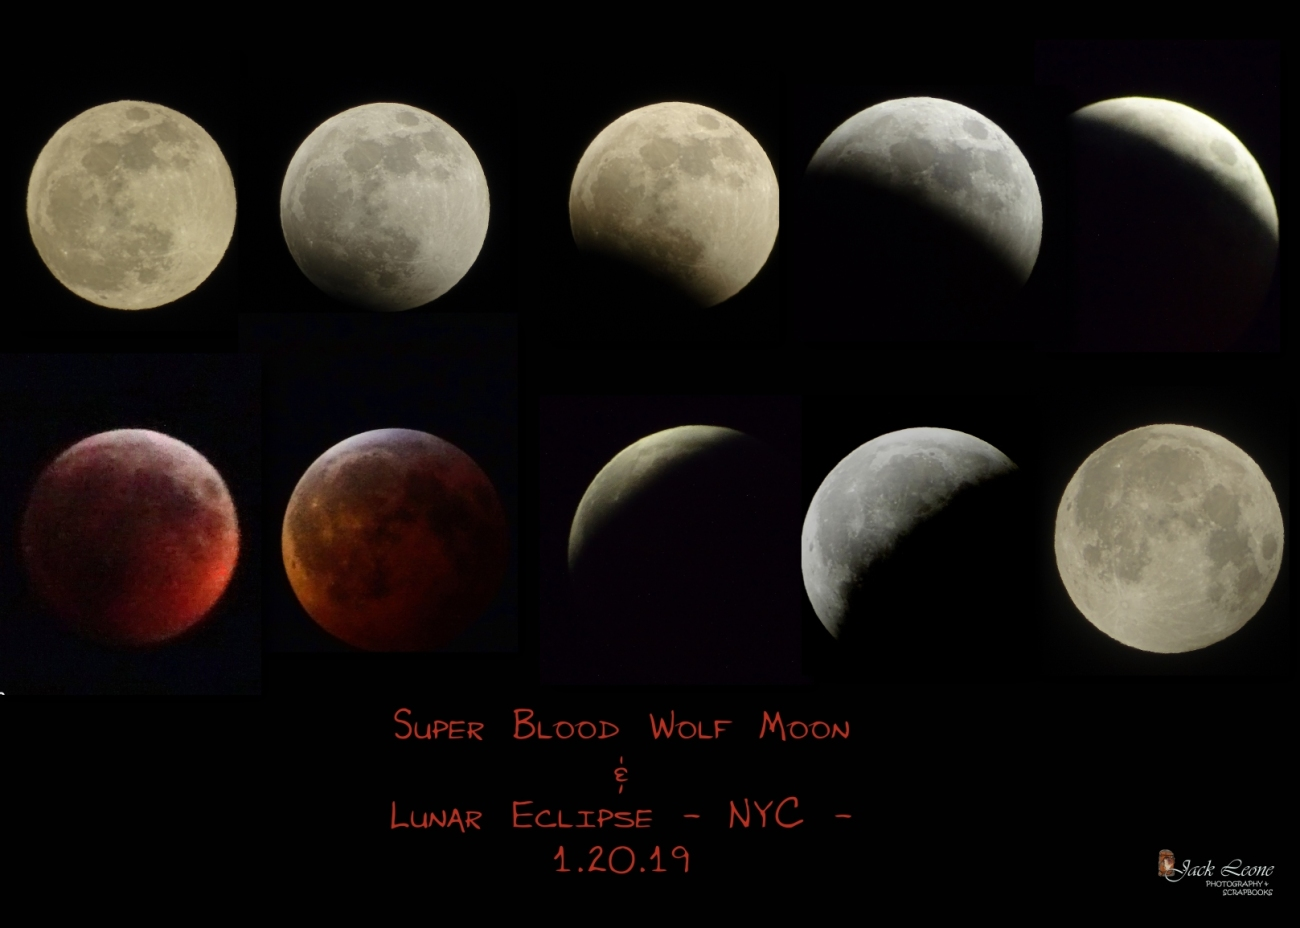 2018 0120 Super Blood Wolf Lunar Eclipselr.jpg